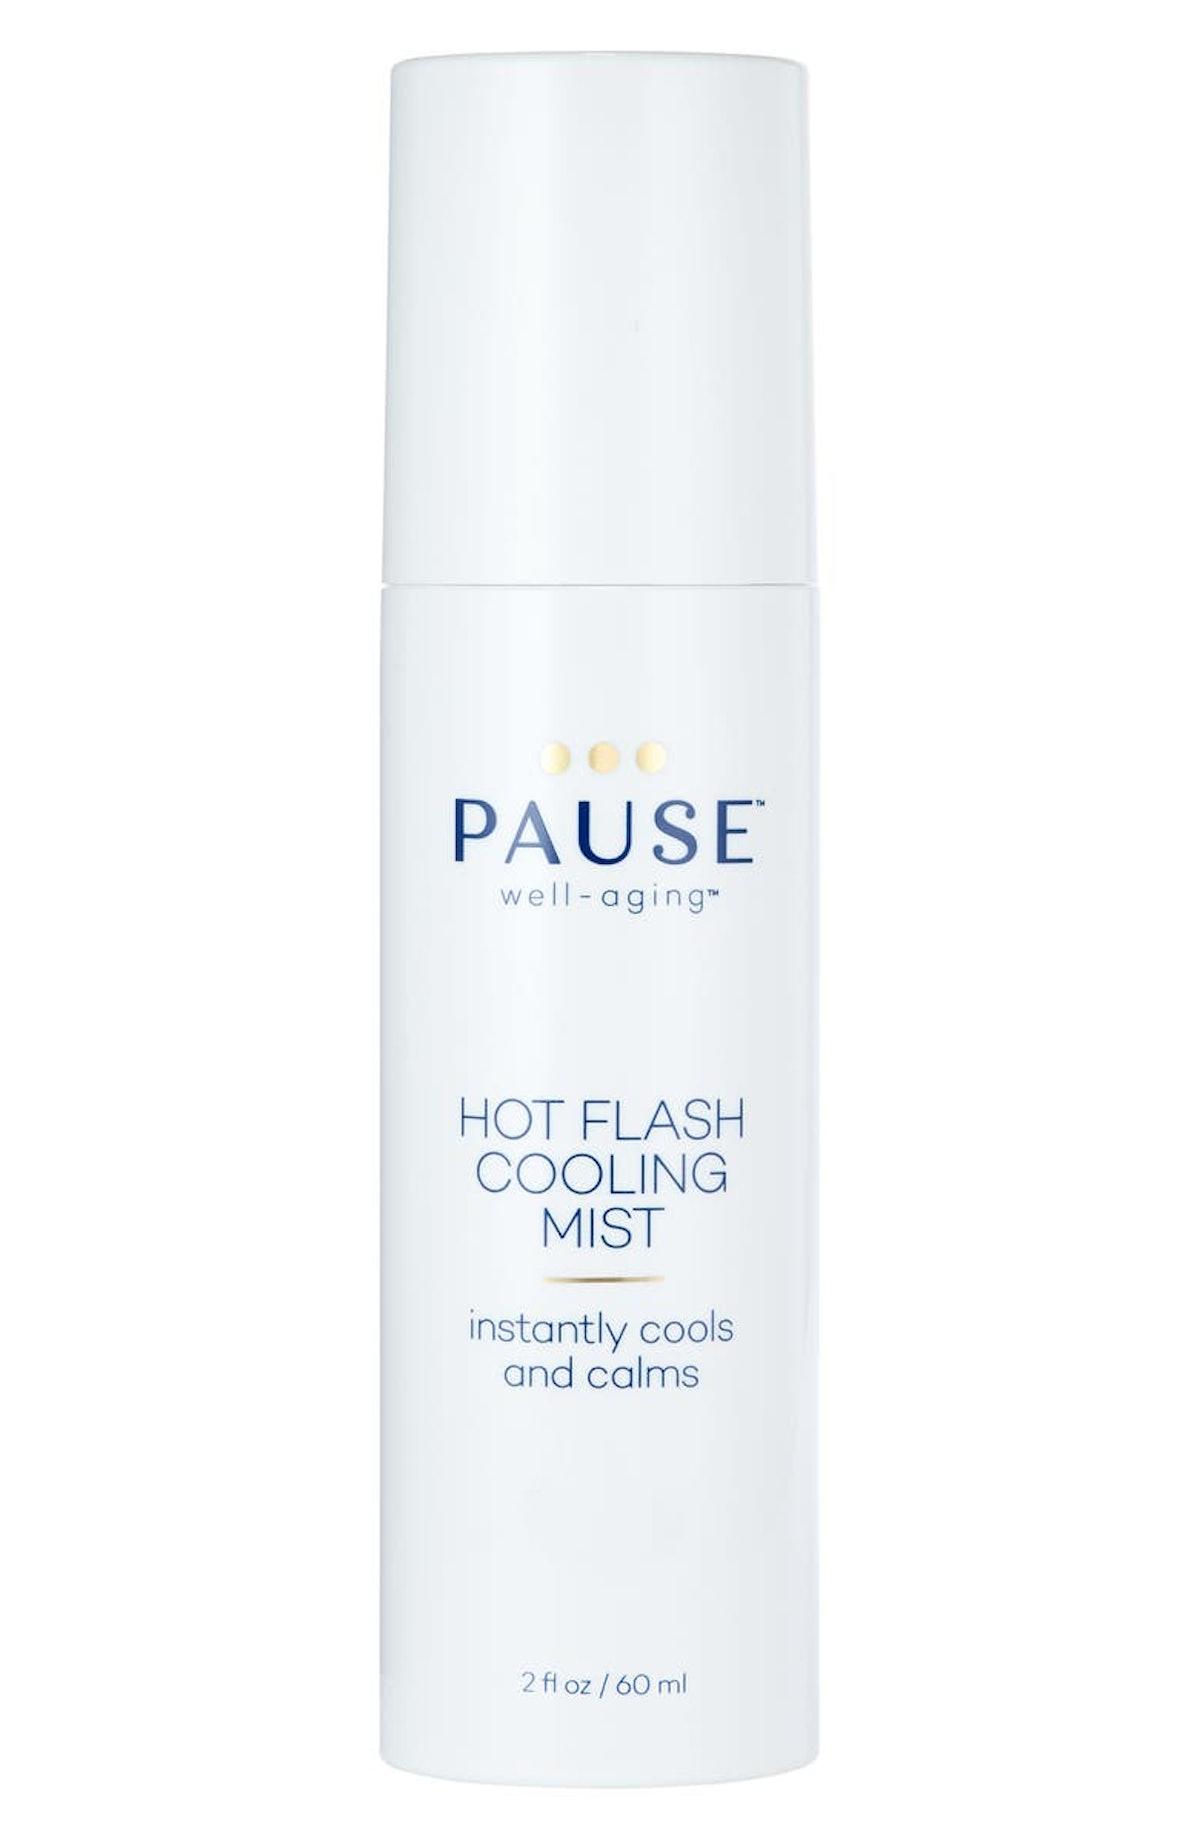 Hot Flash Cooling Mist